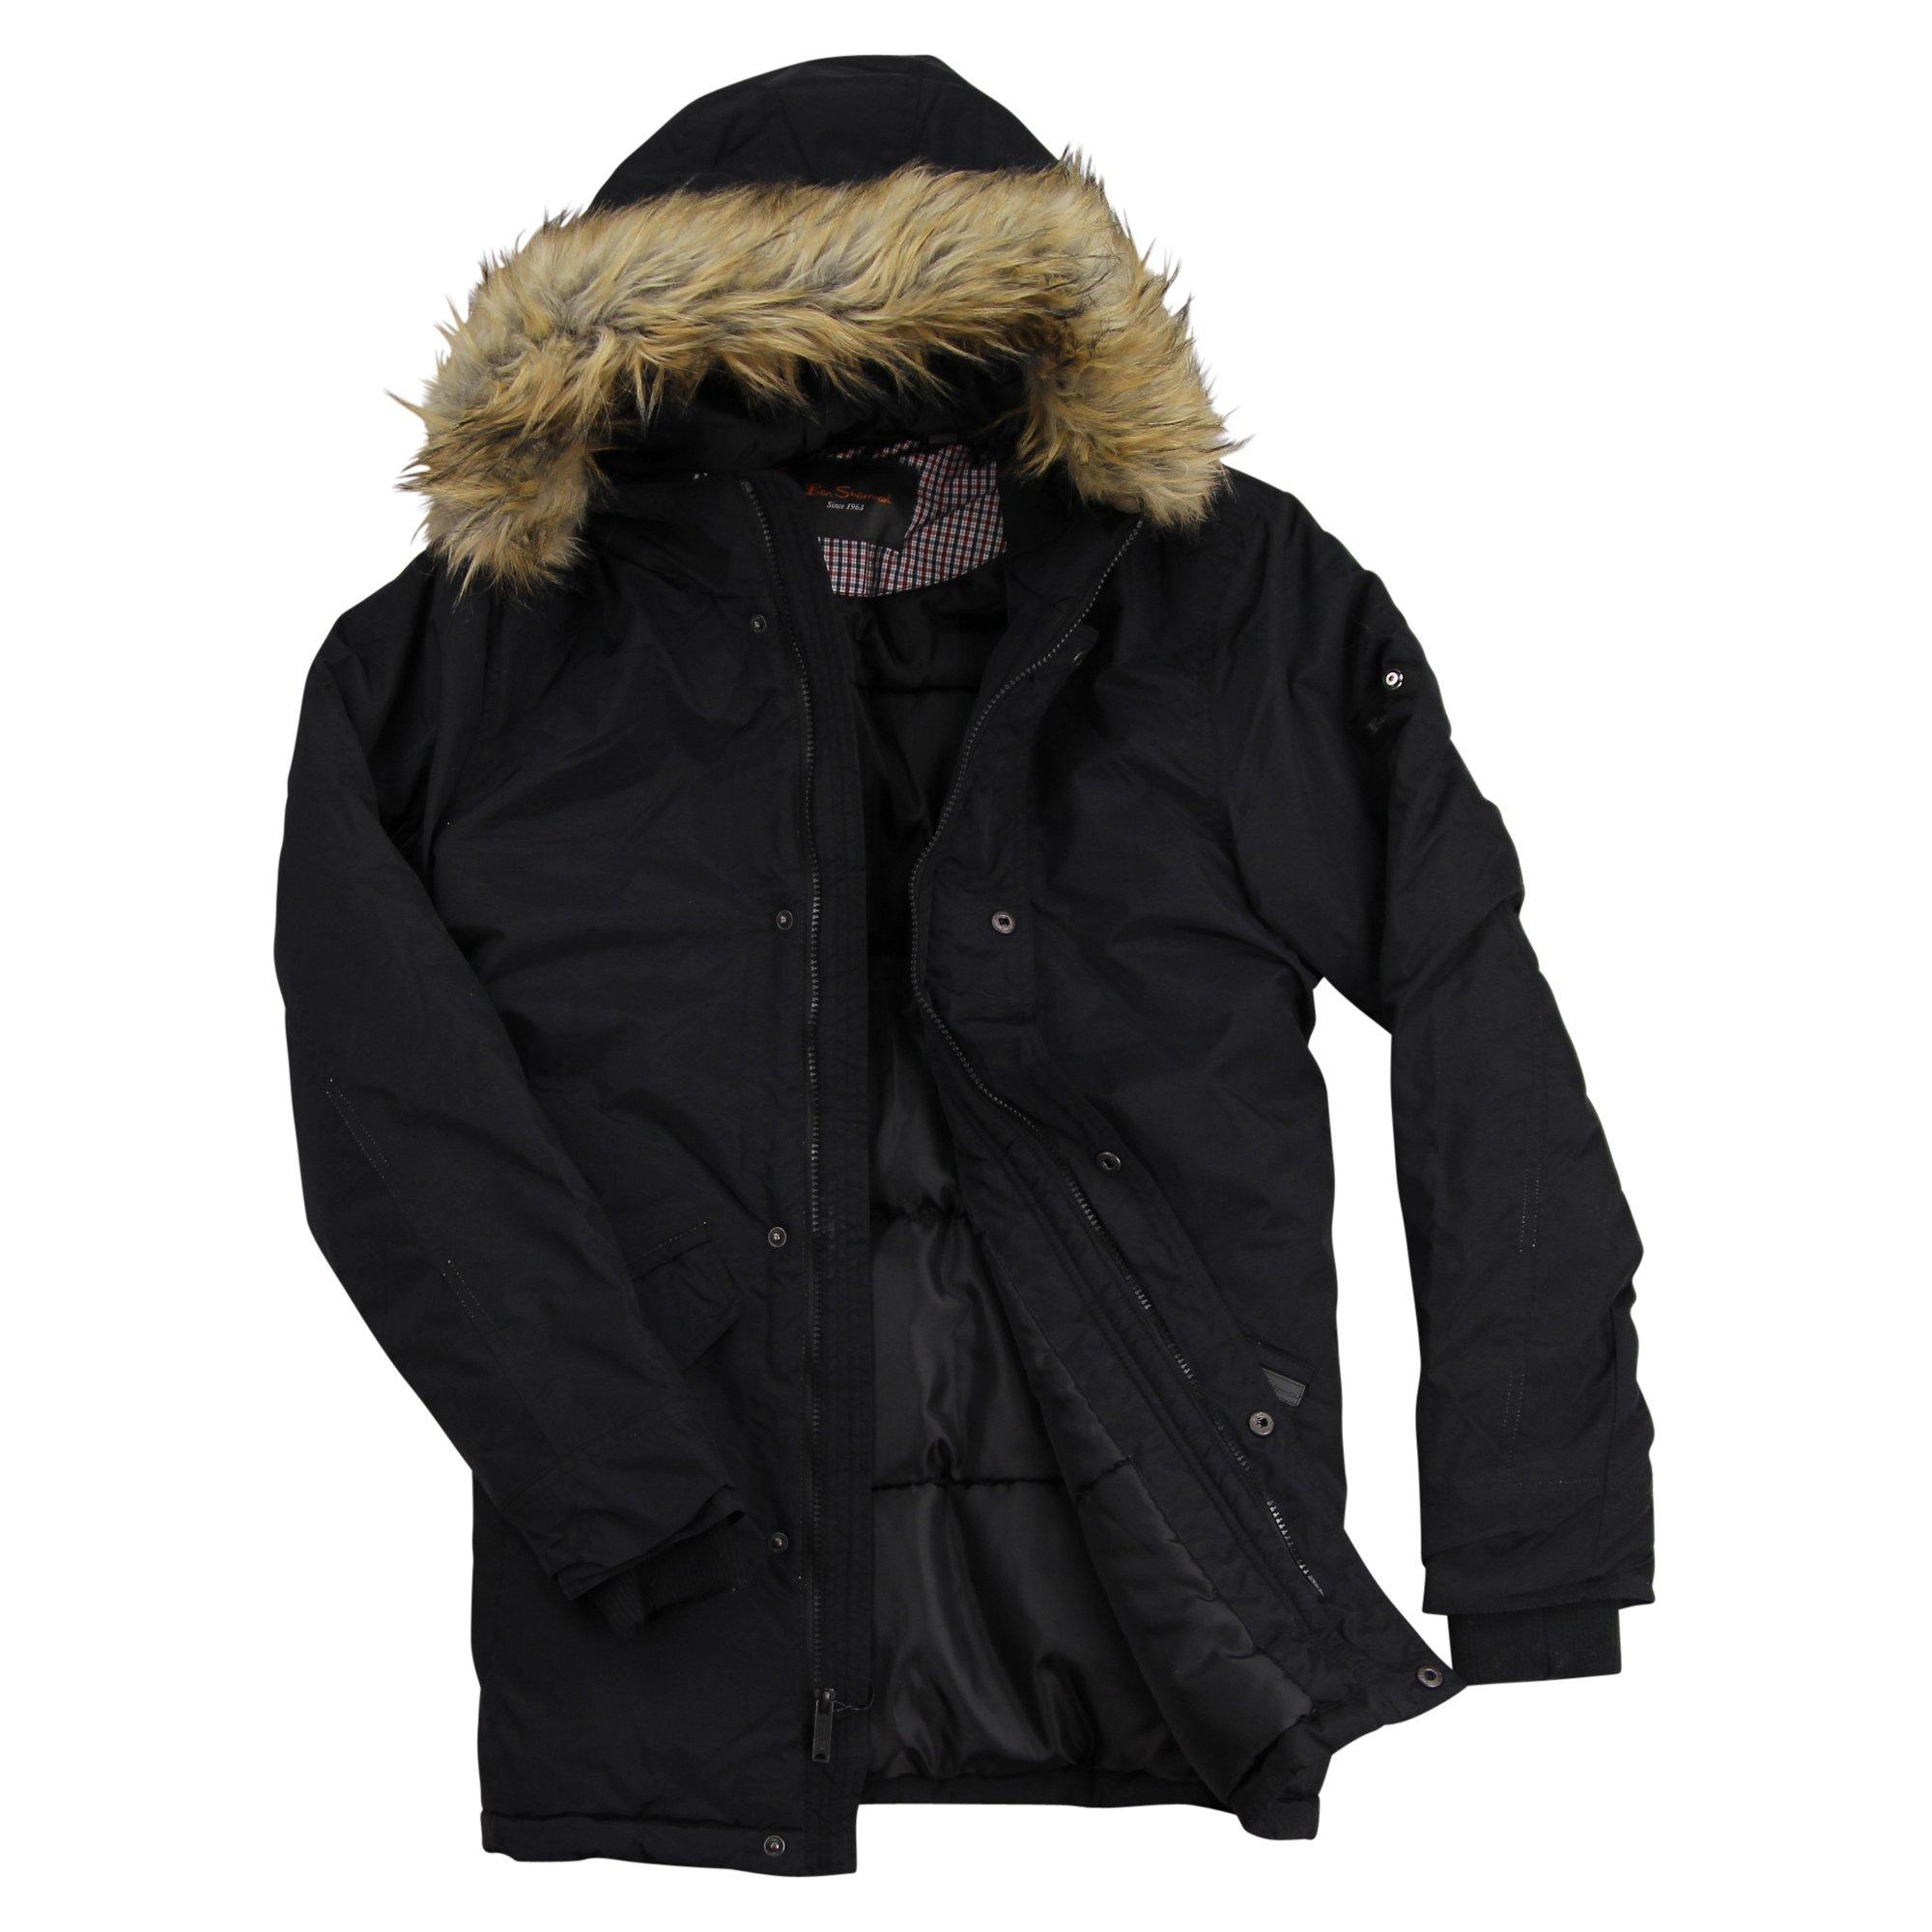 Ben Sherman Men's Parka Jacket, Black, XL